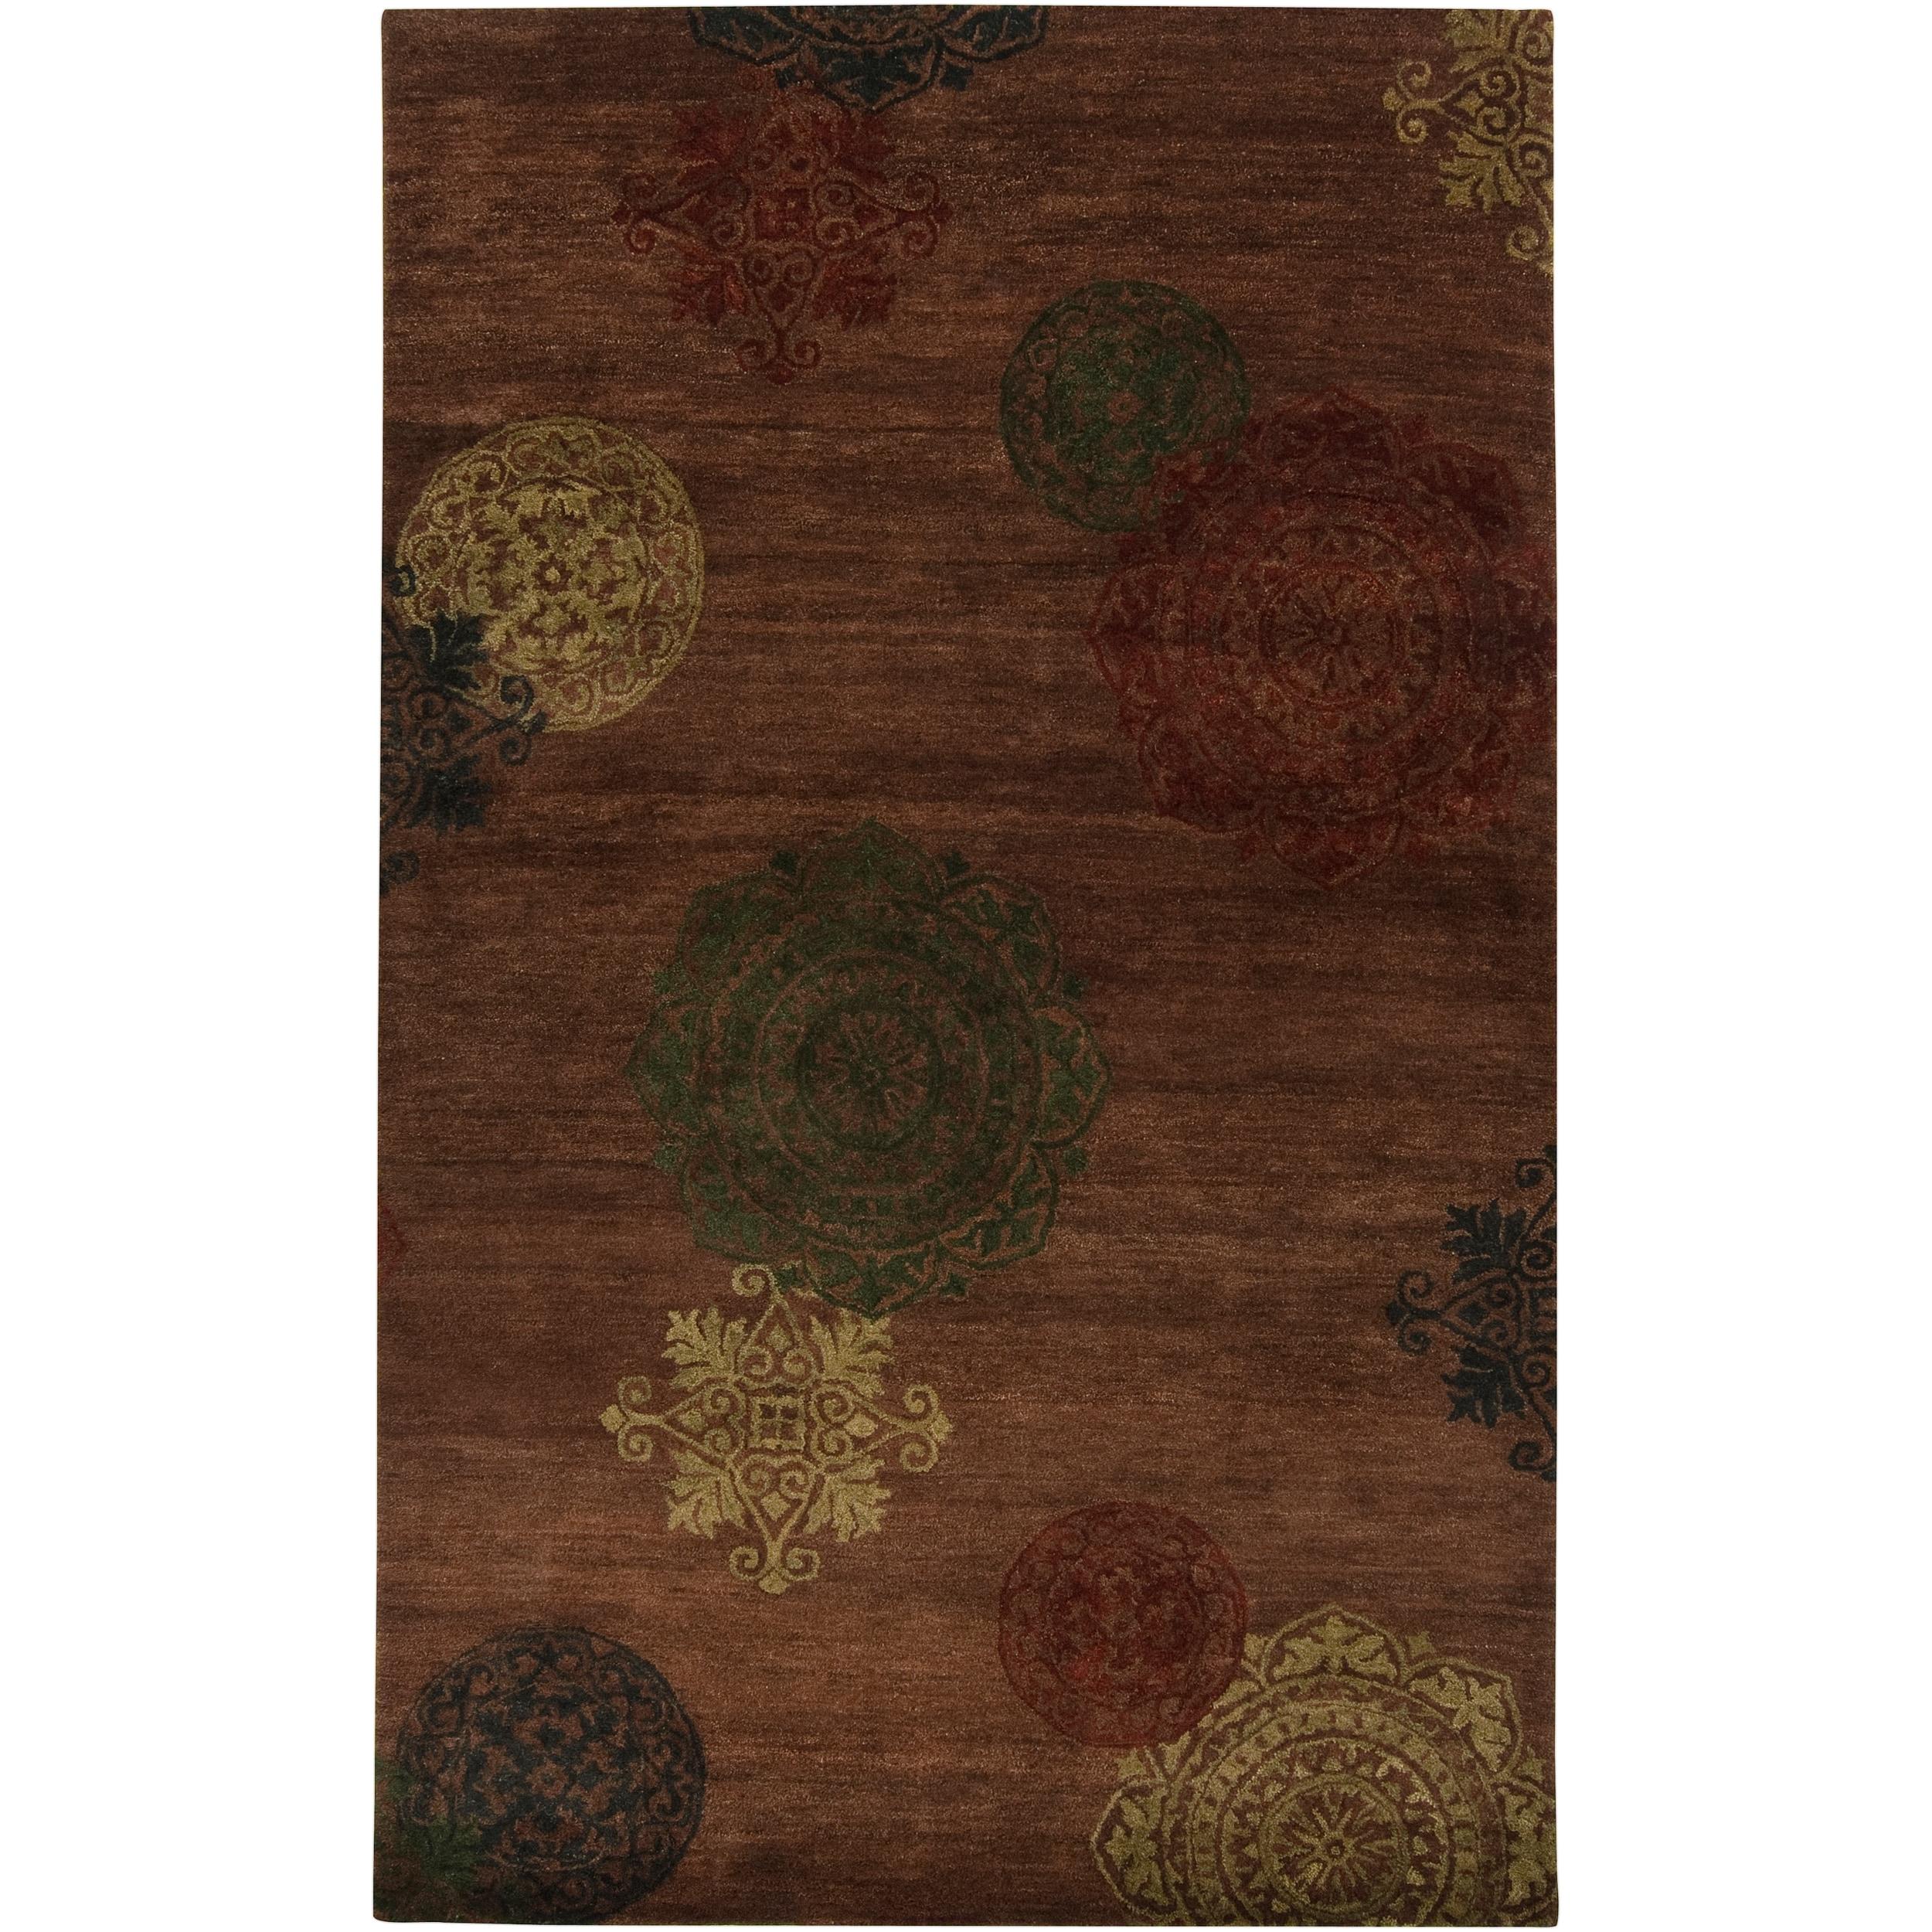 Hand-tufted Ferus Brown New Zealand Wool Rug (5' x 8')